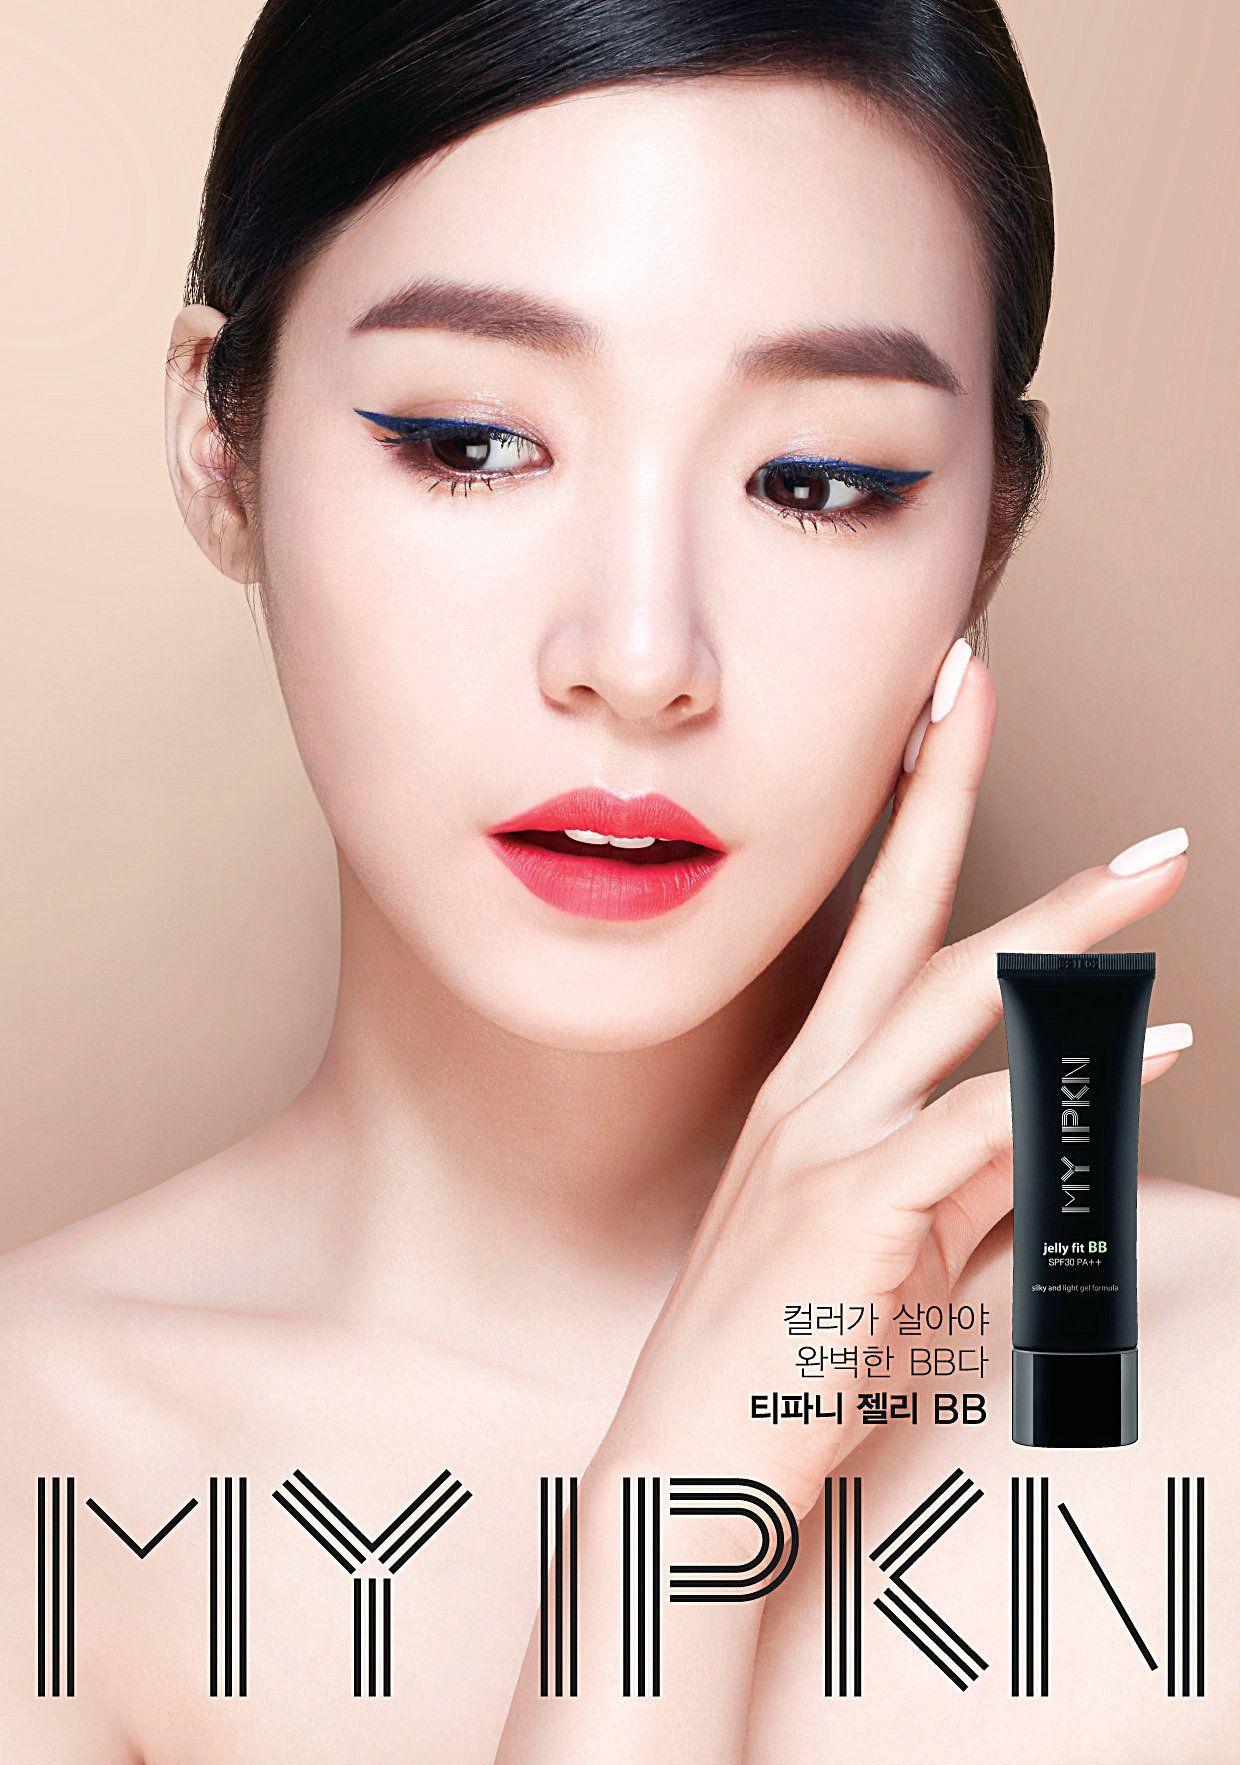 * Tiffany * BB Cream: http://en.koreadepart.com/item/1427786365/ipkn-my-jelly-fit-bb-spf30-pa